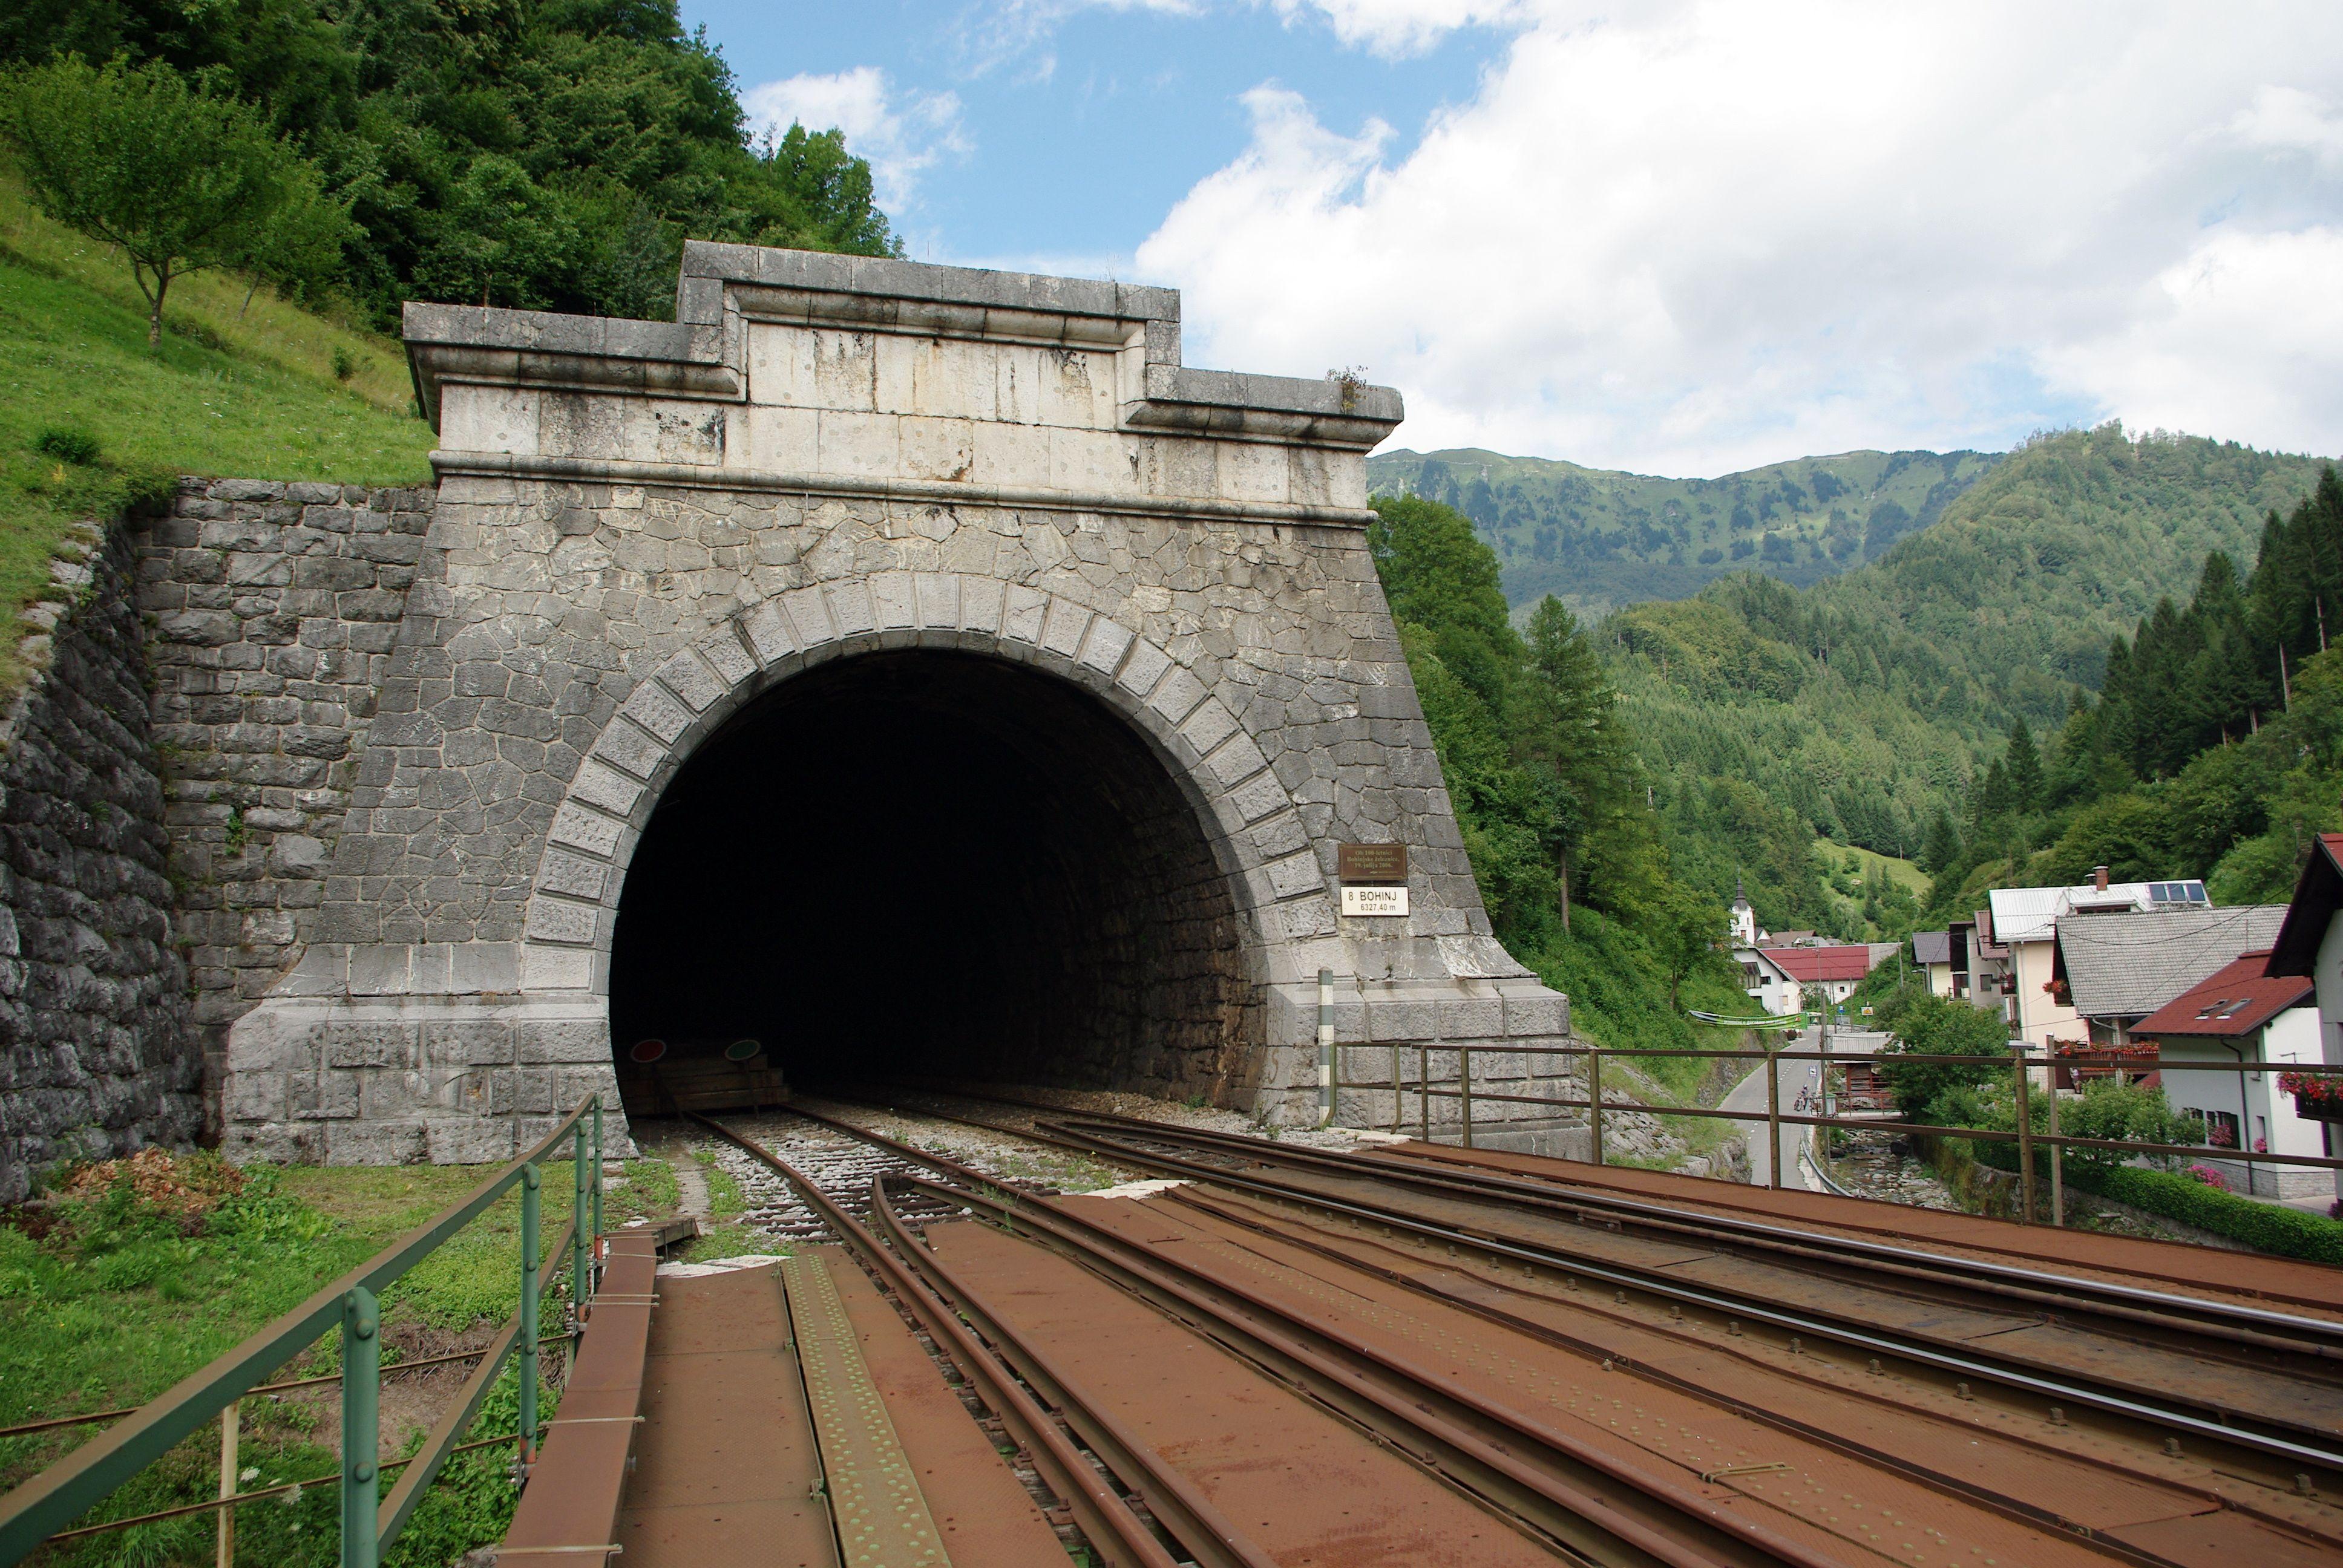 Bohinj Tunnel today #bohinj #Slovenia #SloveniaHolidays #sloveniatourism #sloveniatravel  #tunnel #railways